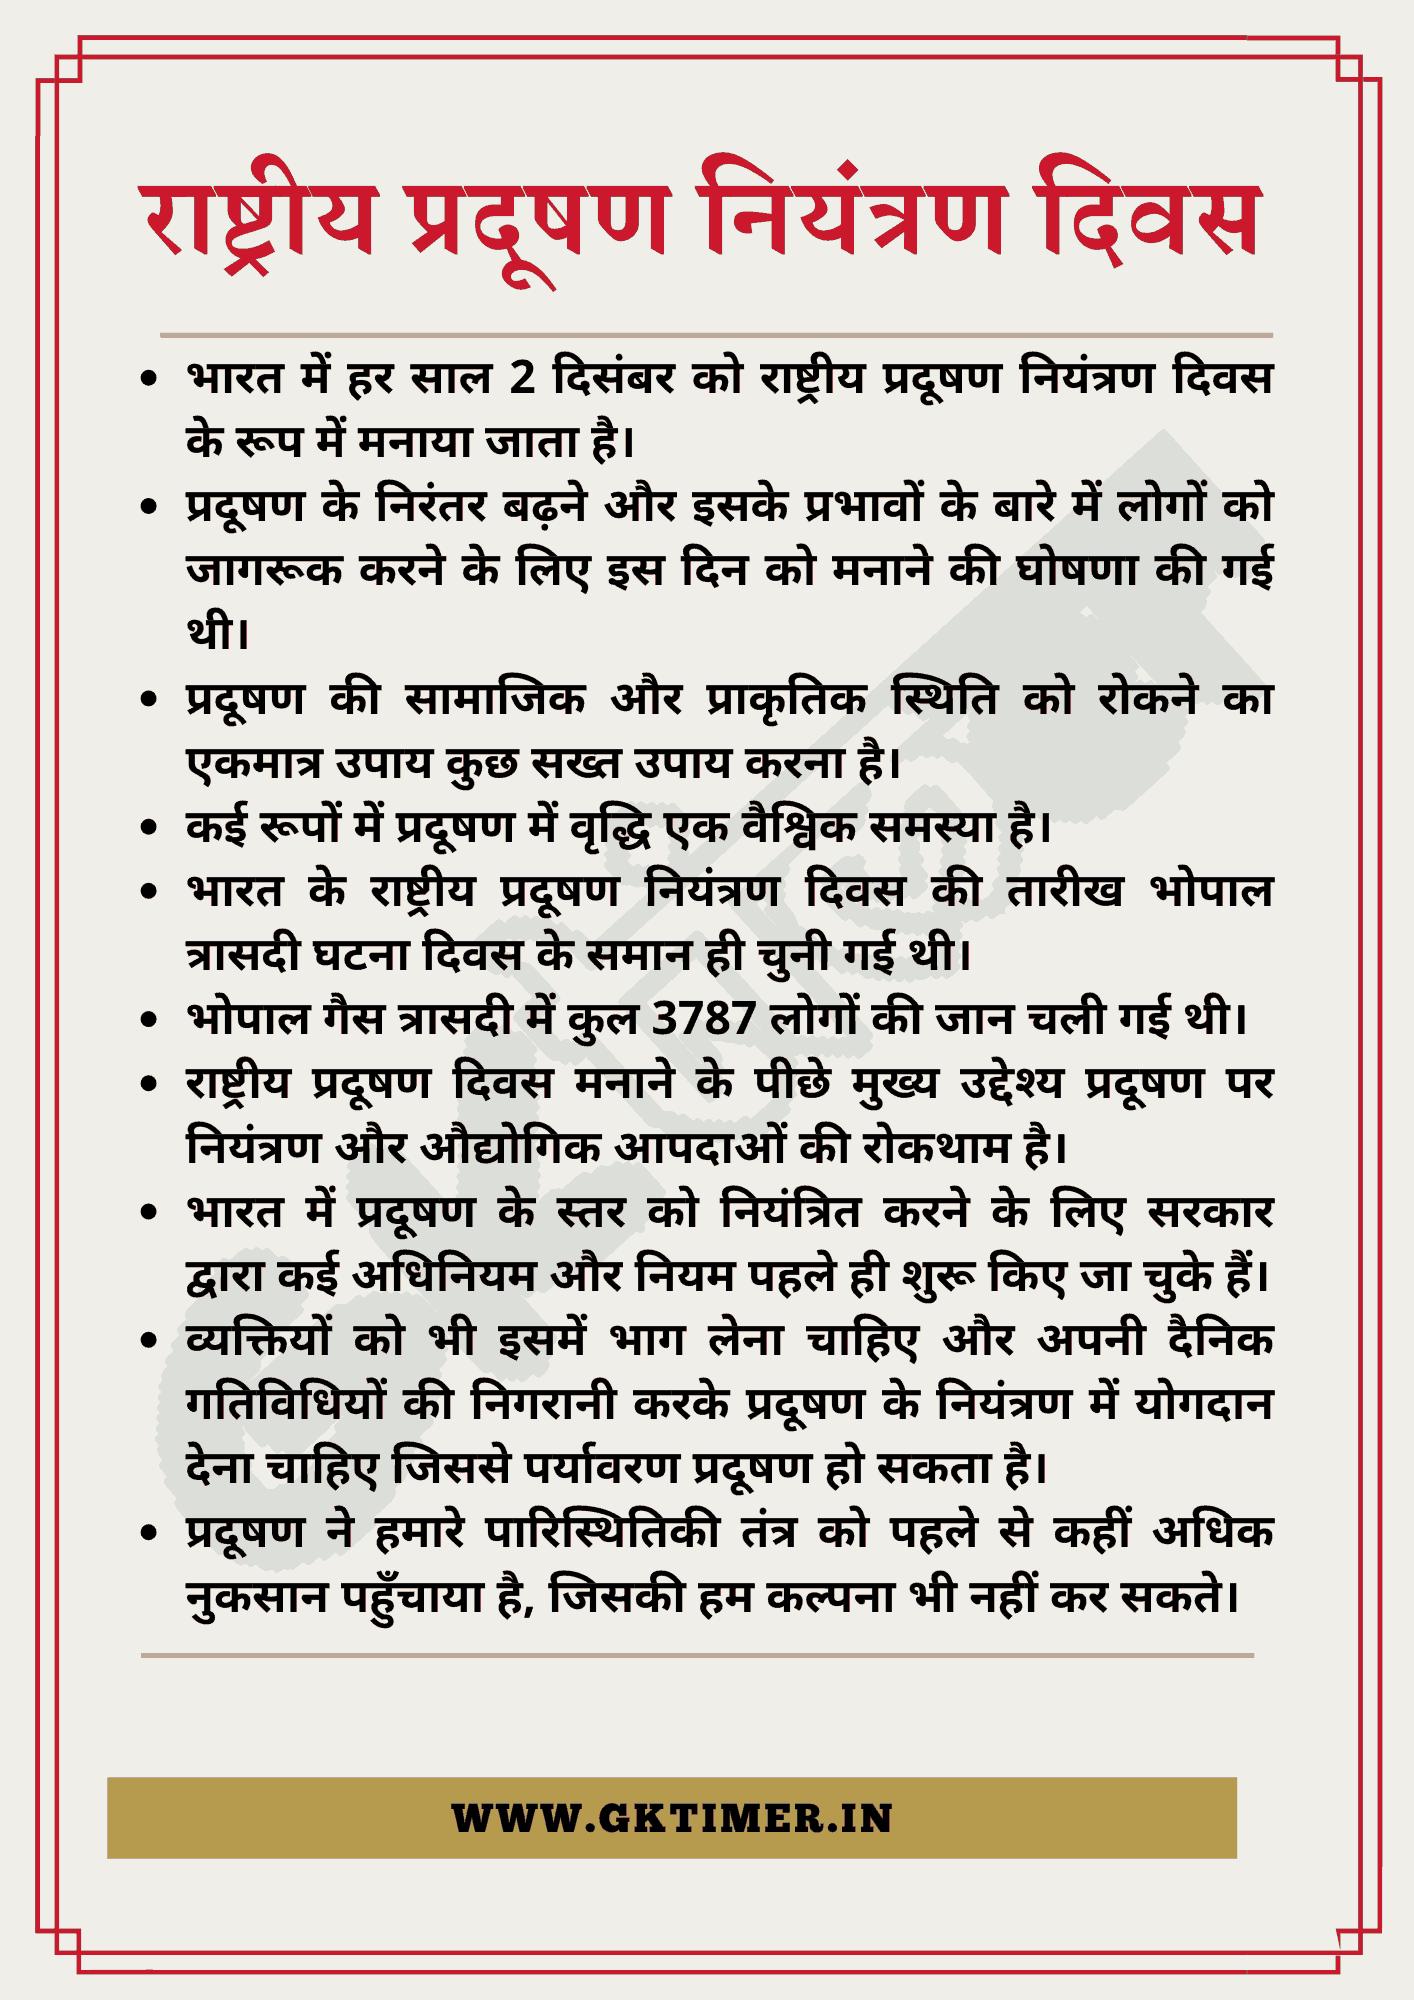 राष्ट्रीय प्रदूषण नियंत्रण दिवस पर निबंध | National Pollution Control Day in Hindi | 10 Lines On National Pollution Control Day in Hindi